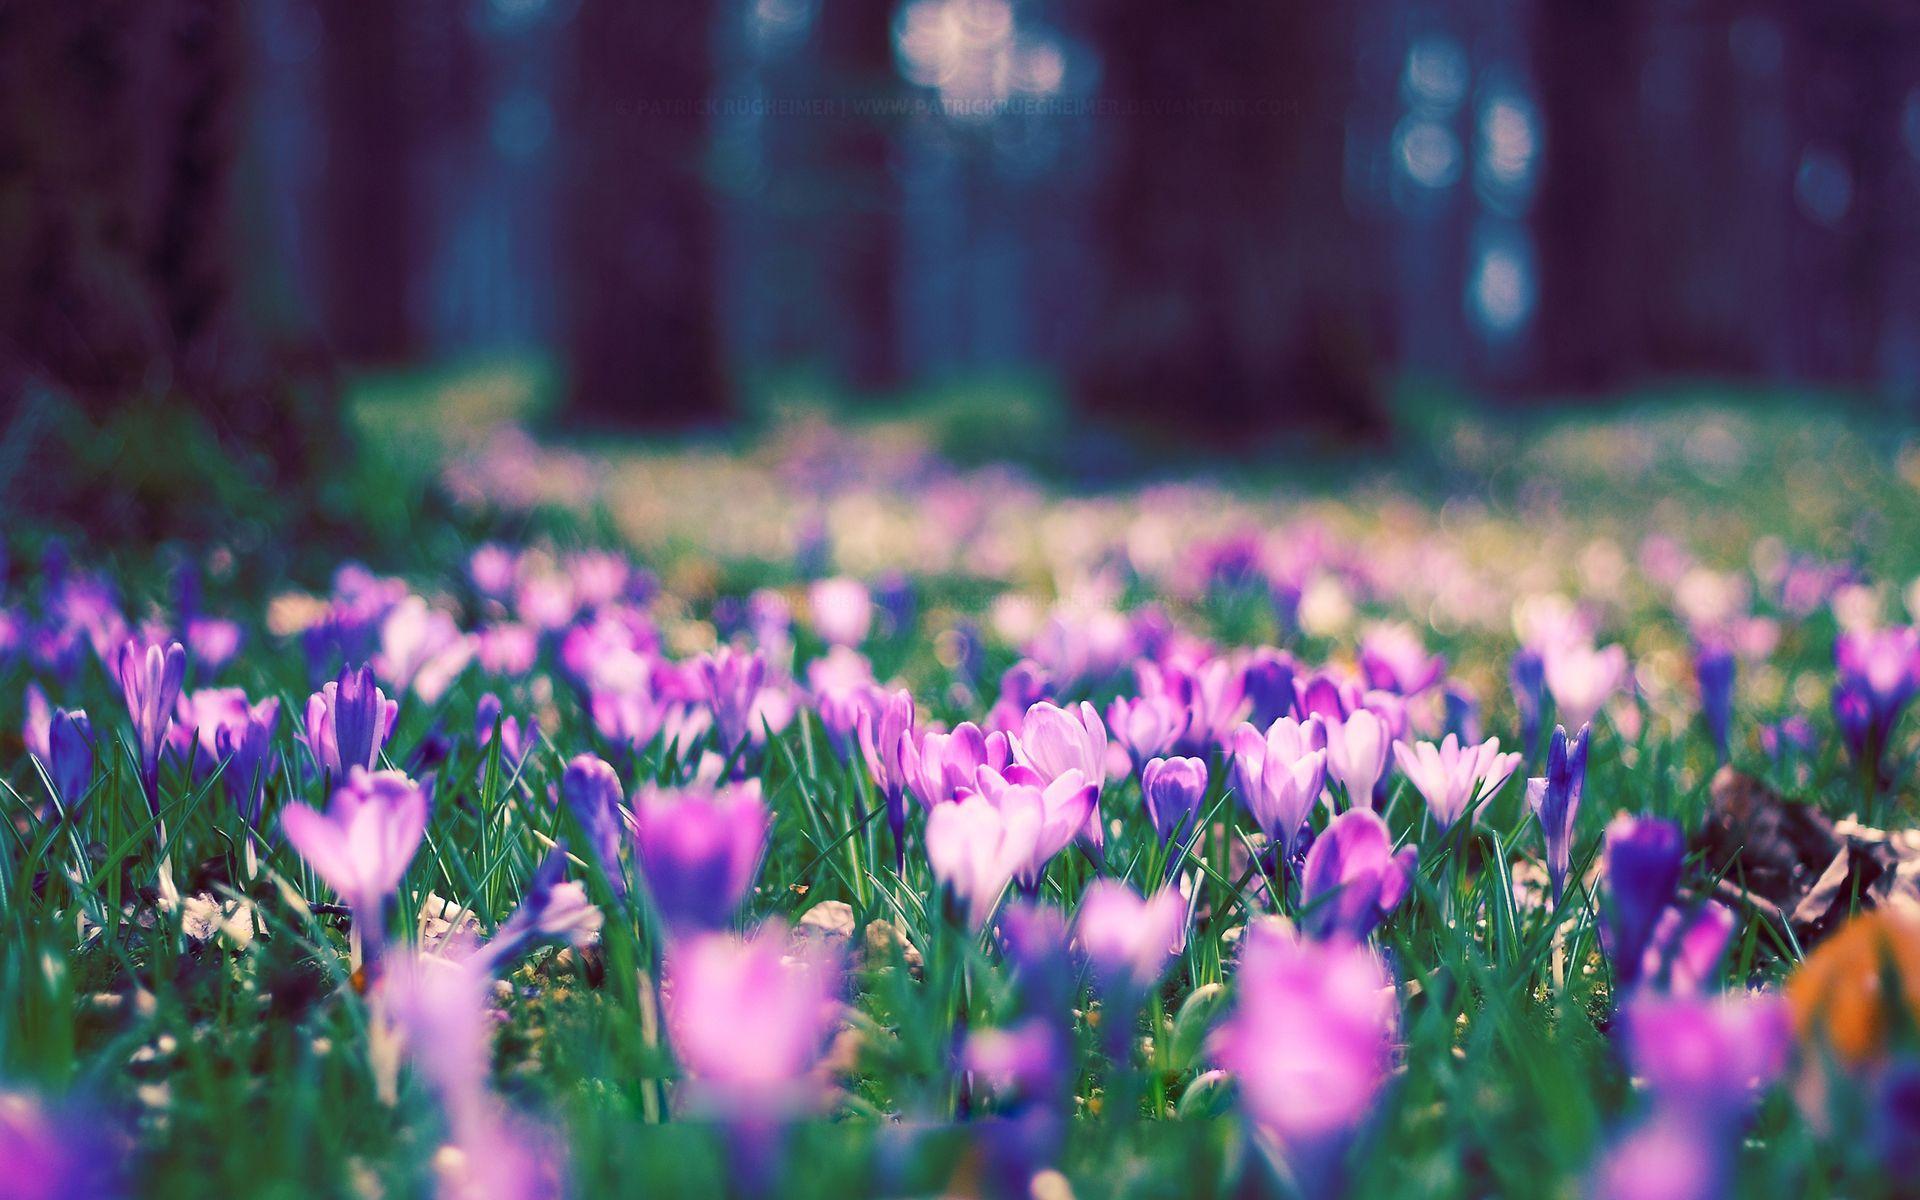 Flower Desktop Wallpapers Top Free Flower Desktop Backgrounds